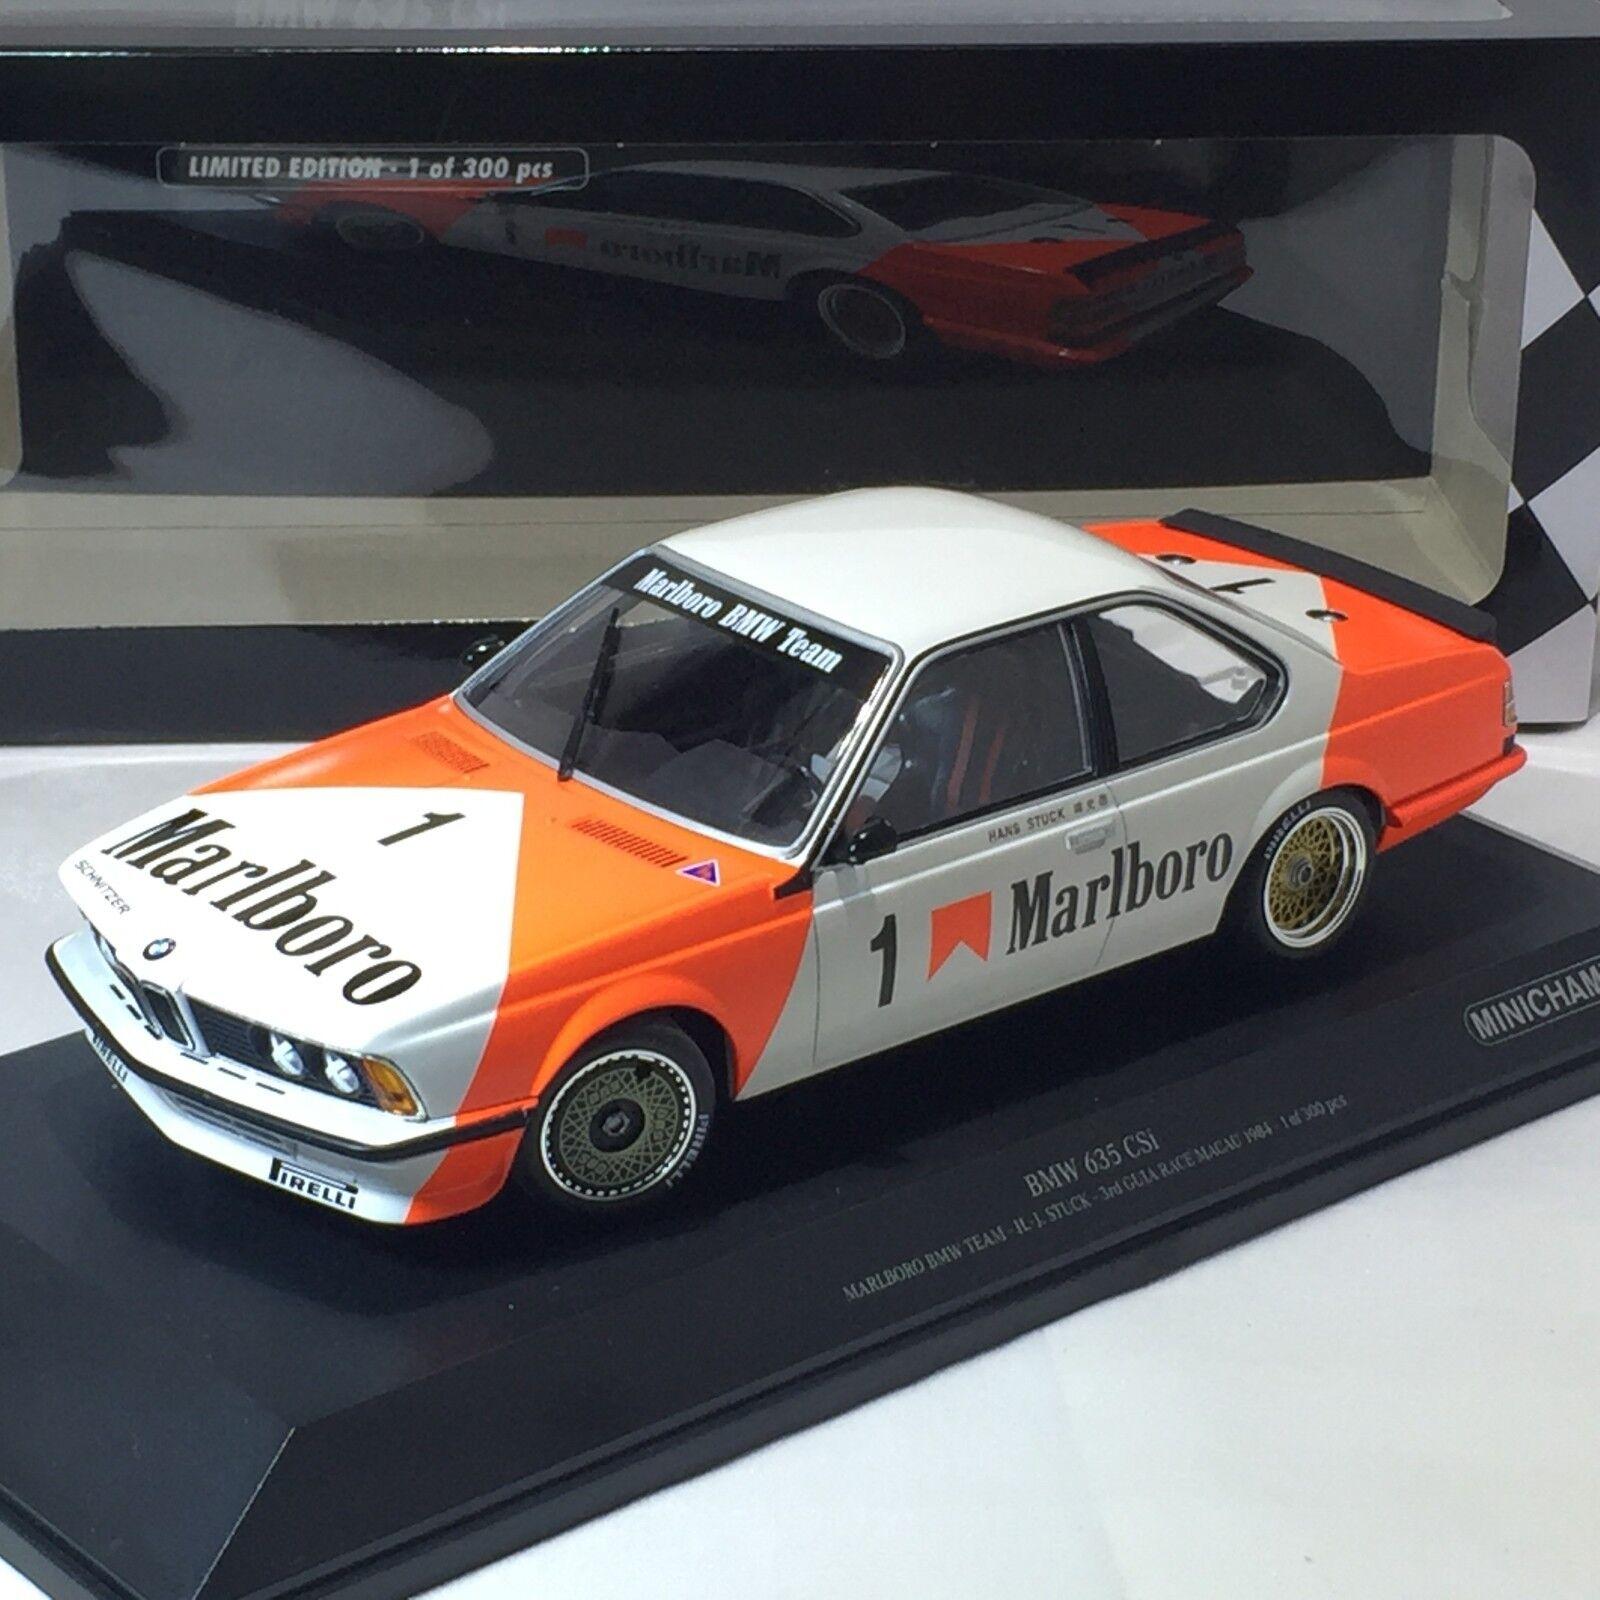 1 18 Minichamps  TM-155842501 BMW 635CSI Gr. un han pegado Macao Guia 1984 3rd Plac